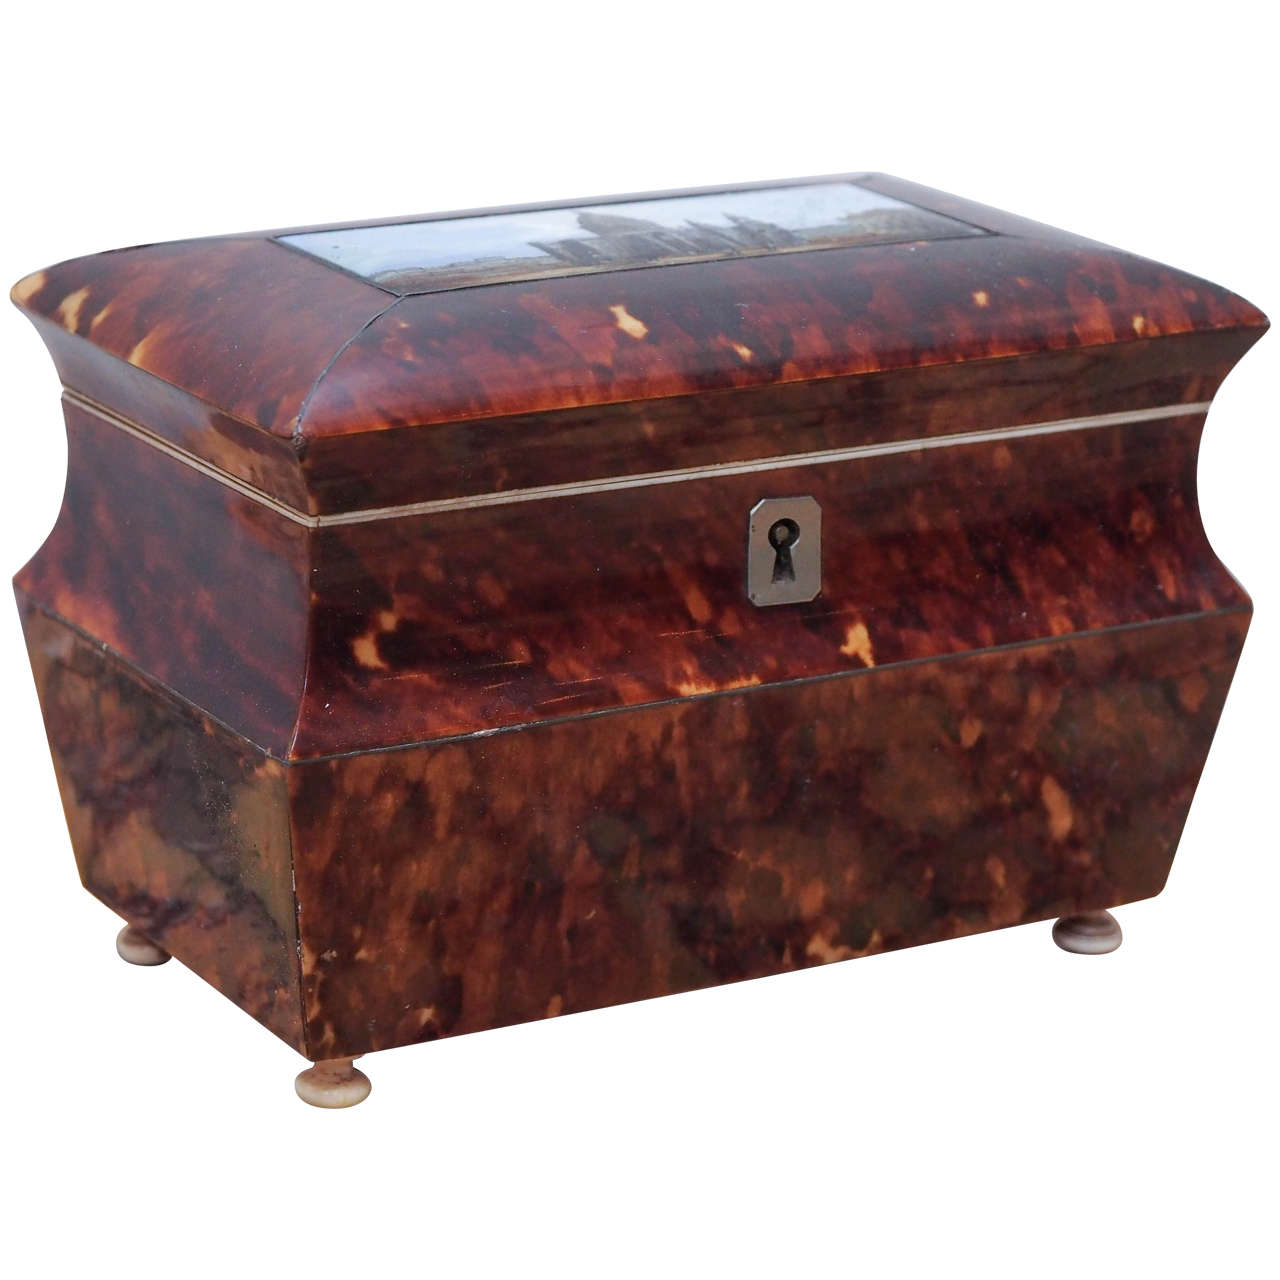 English Victorian Tortoiseshell Tea Caddy with Eglomise Panel